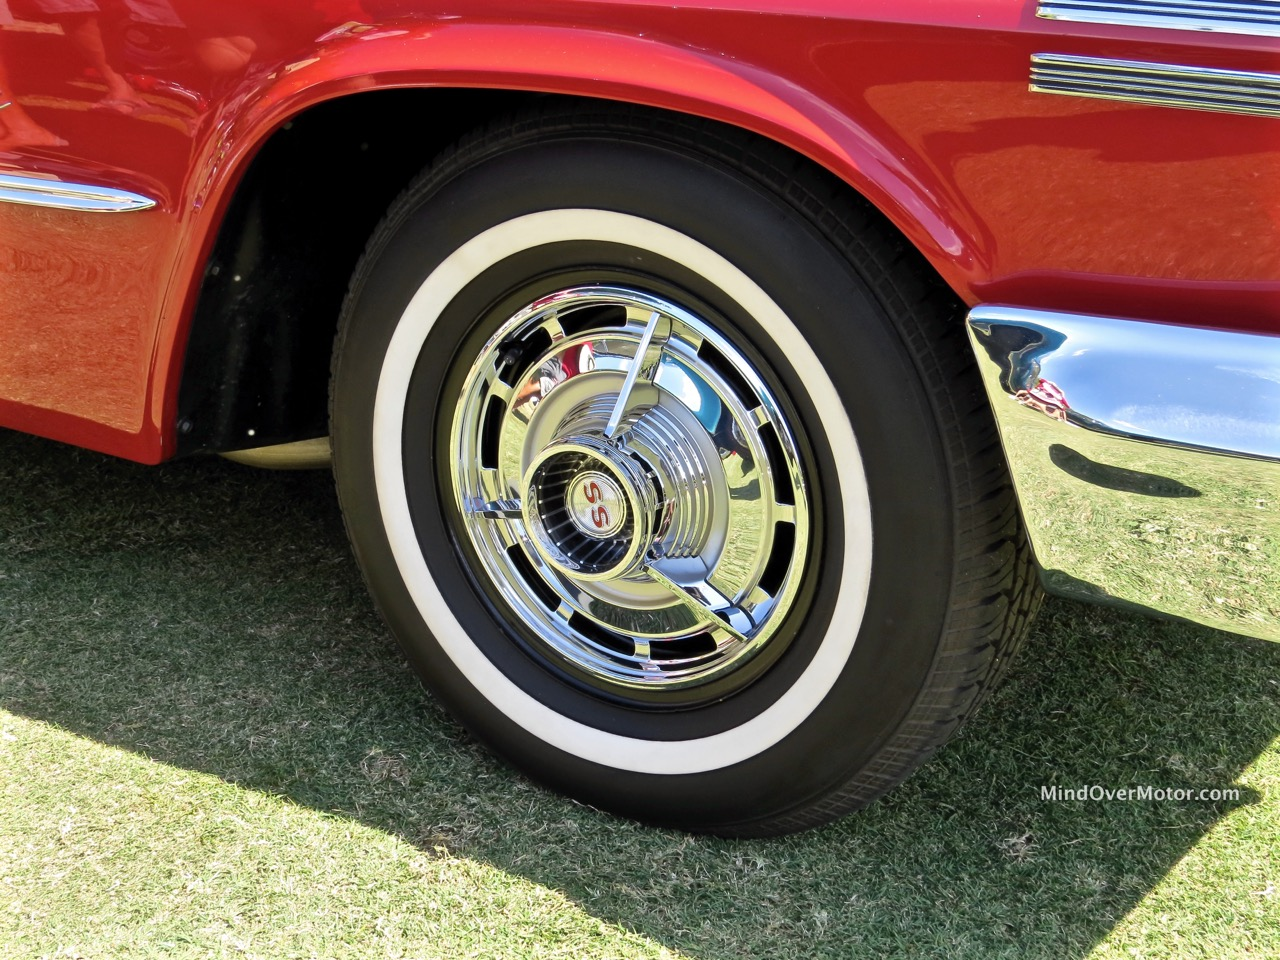 1963 Chevrolet Impala SS Wheel Cover